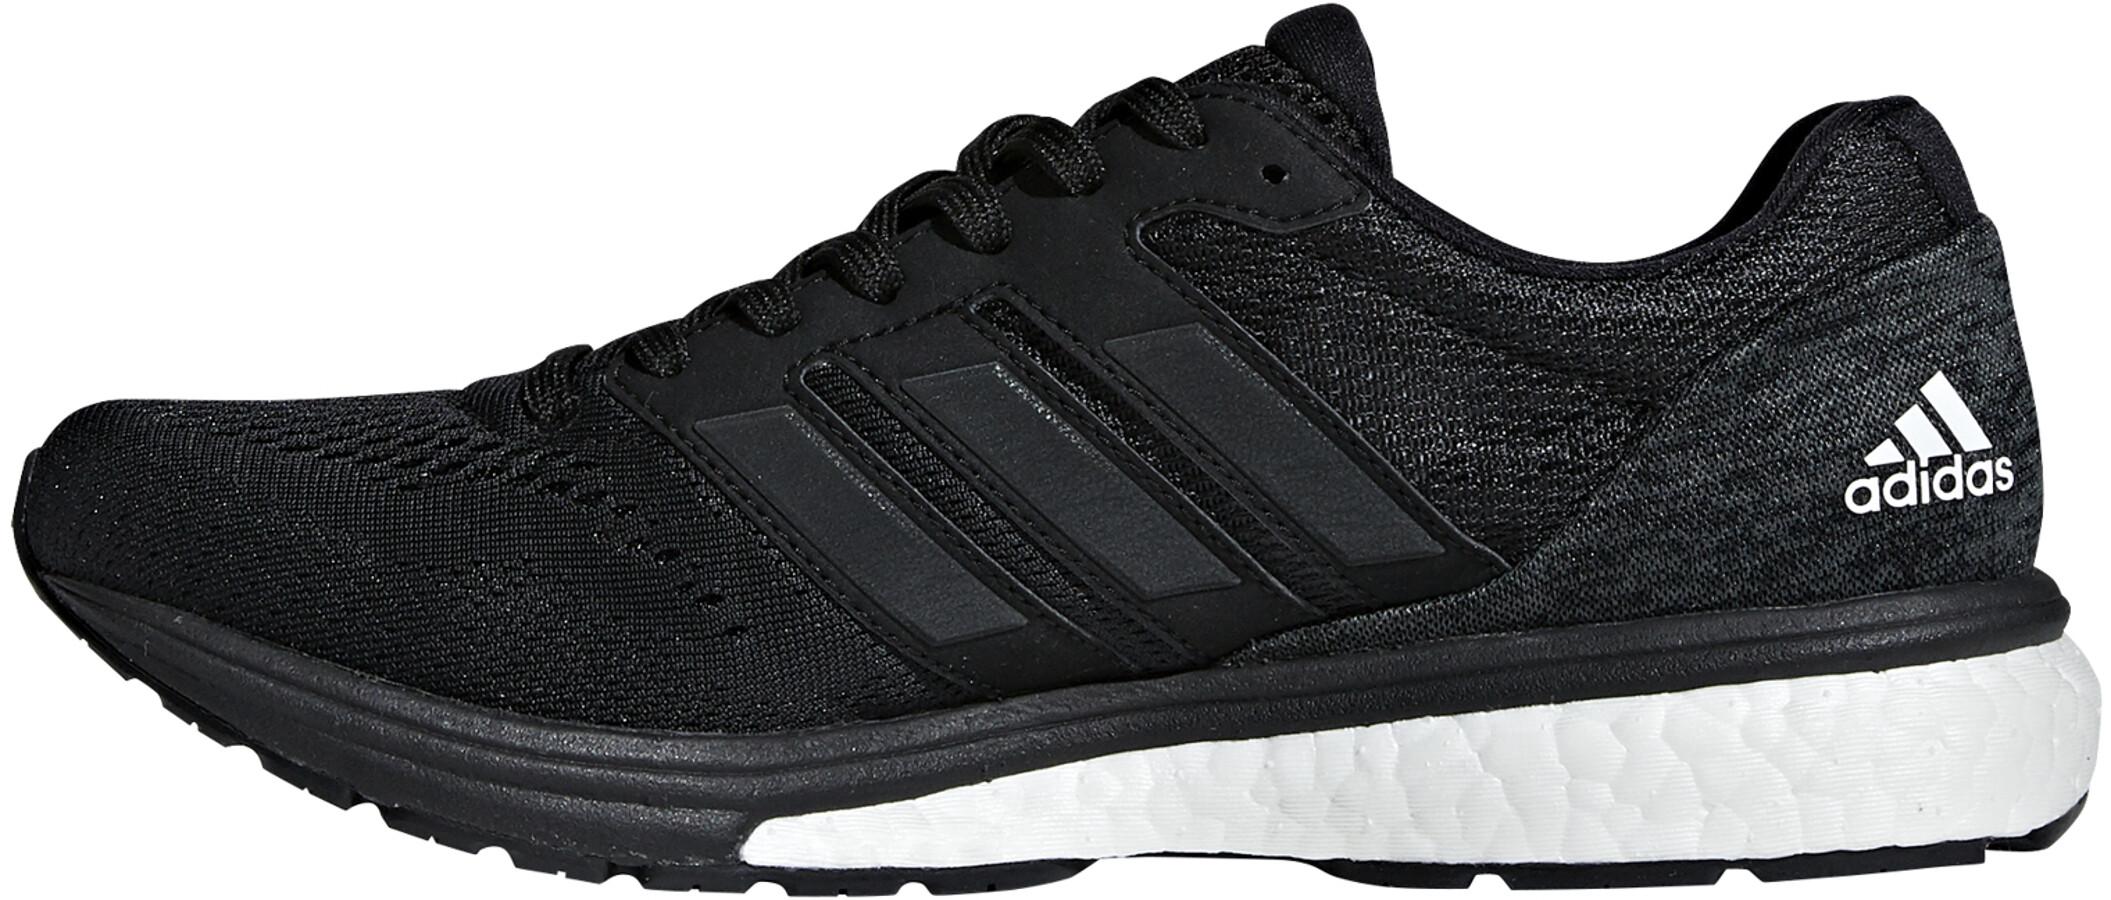 designer fashion 72eda 4ec43 adidas Adizero Boston 7 - Chaussures running - noir